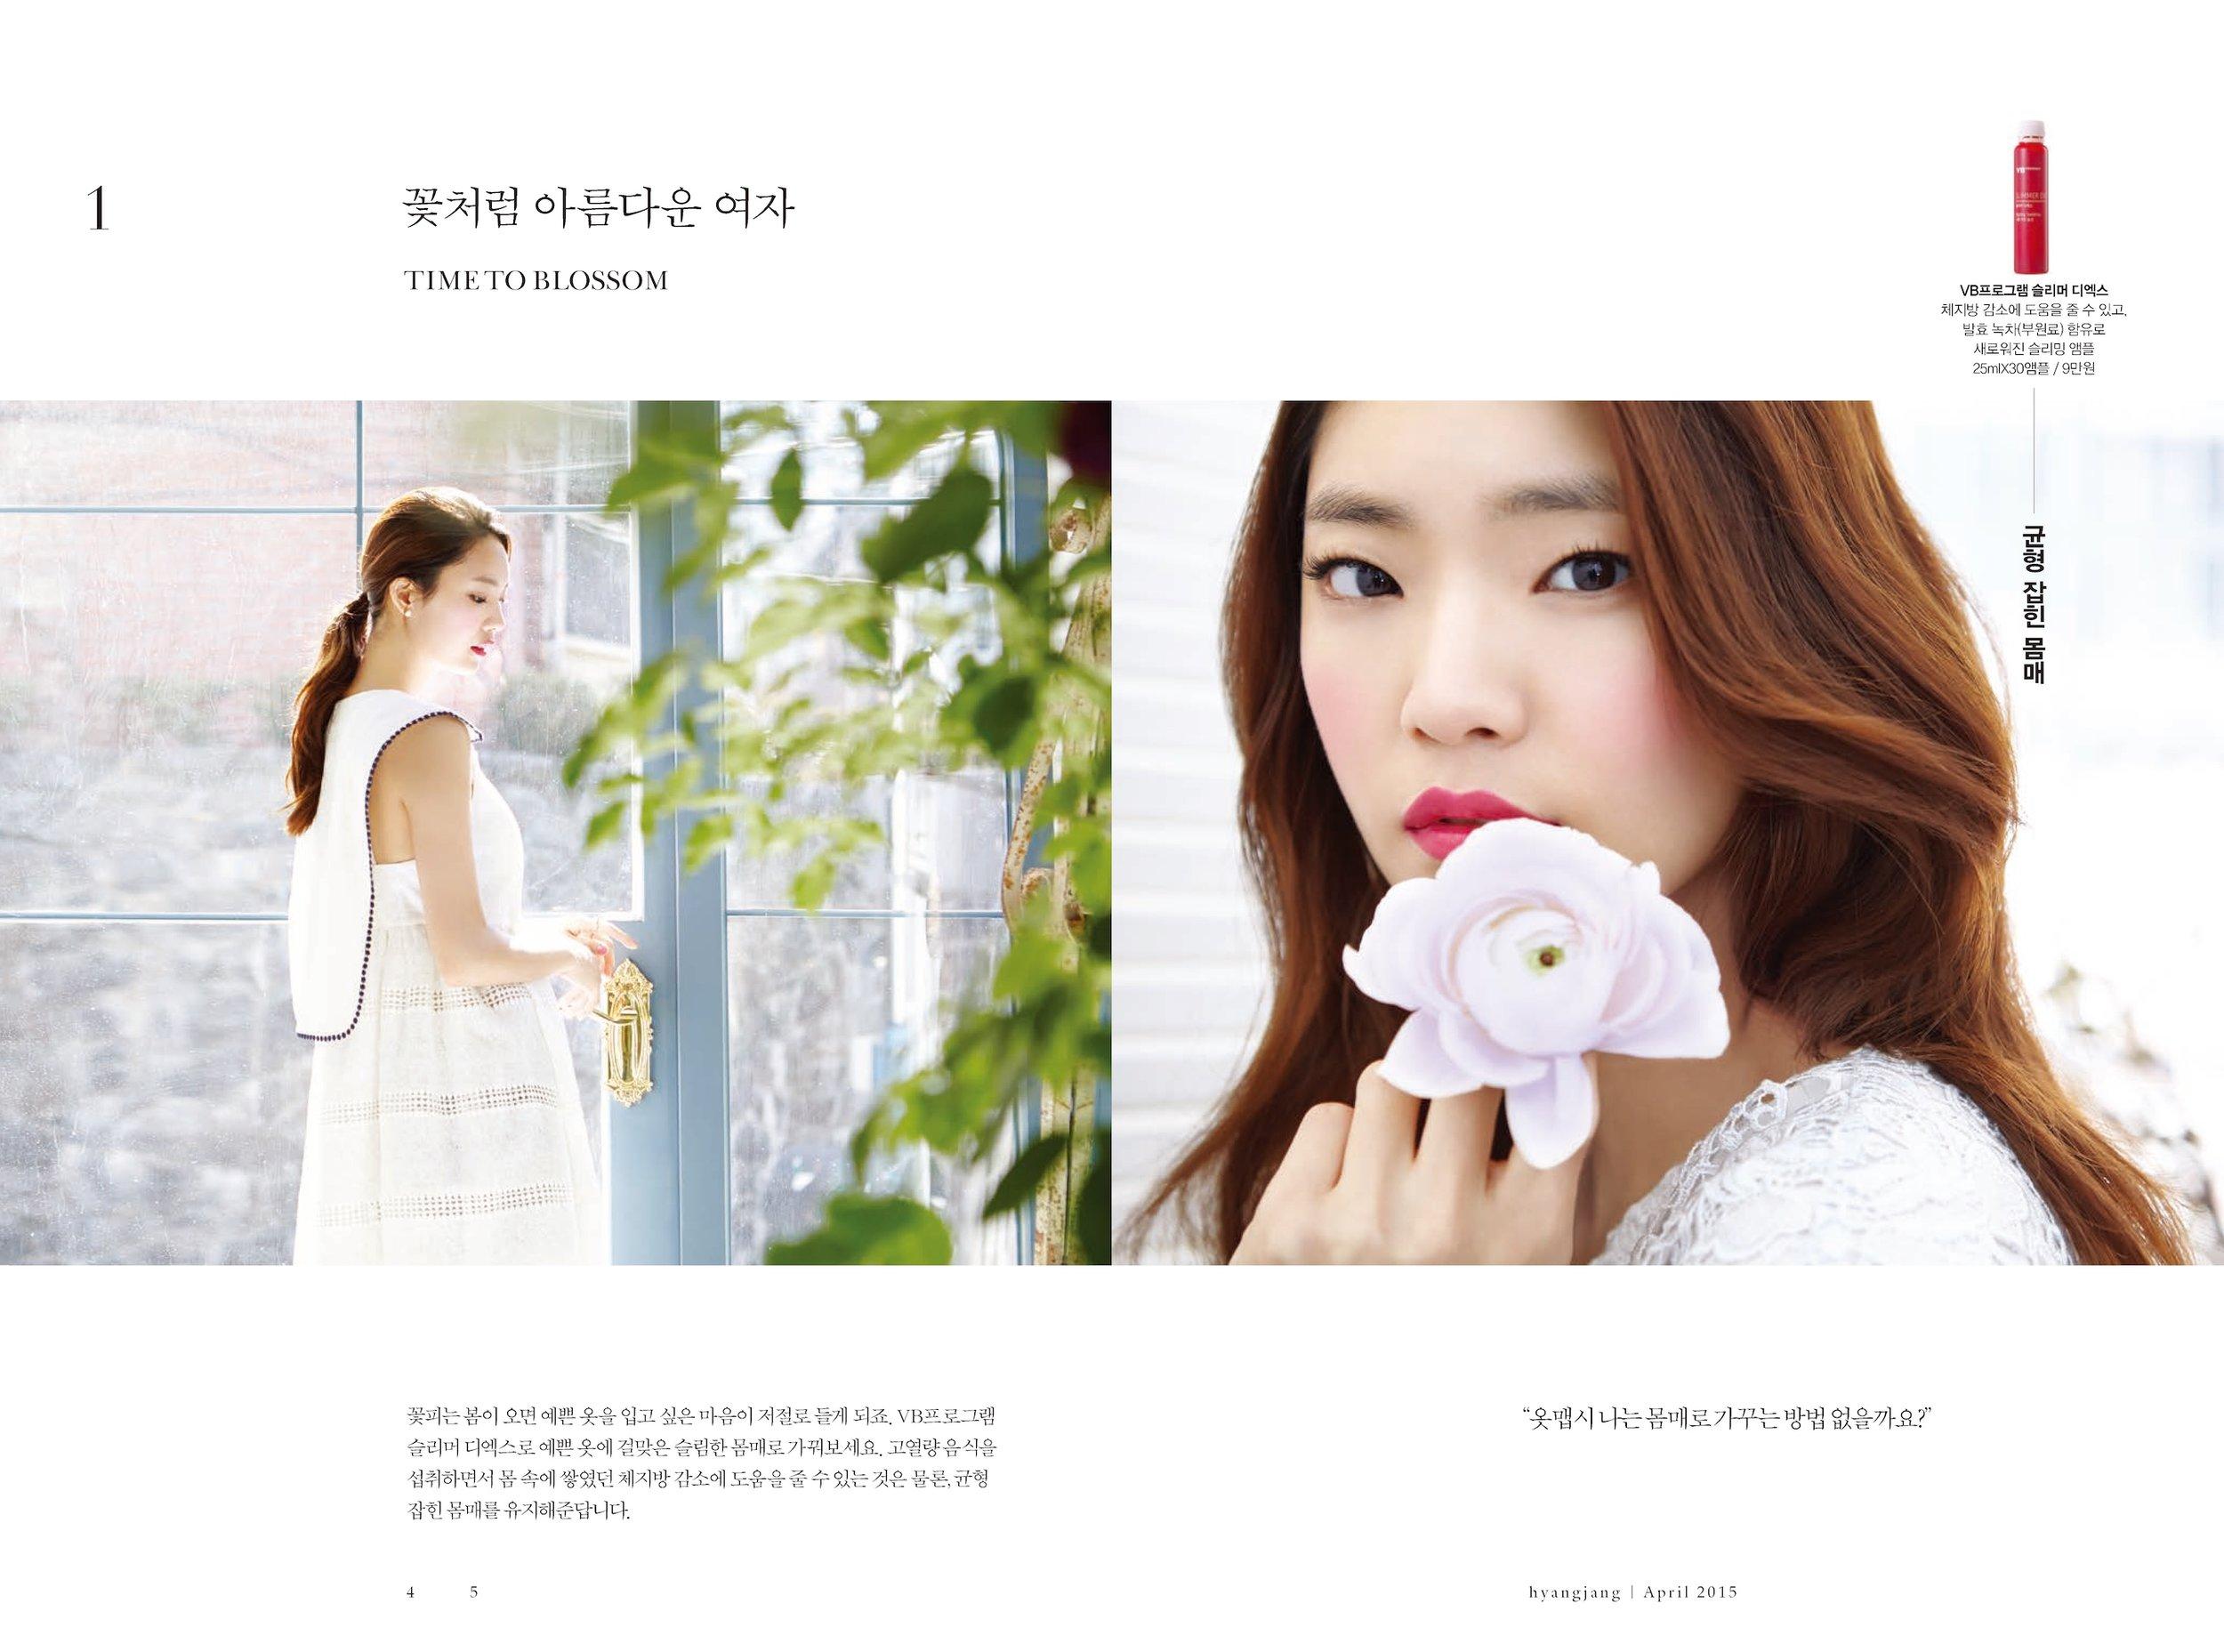 hyangjang-201504_페이지_03.jpeg